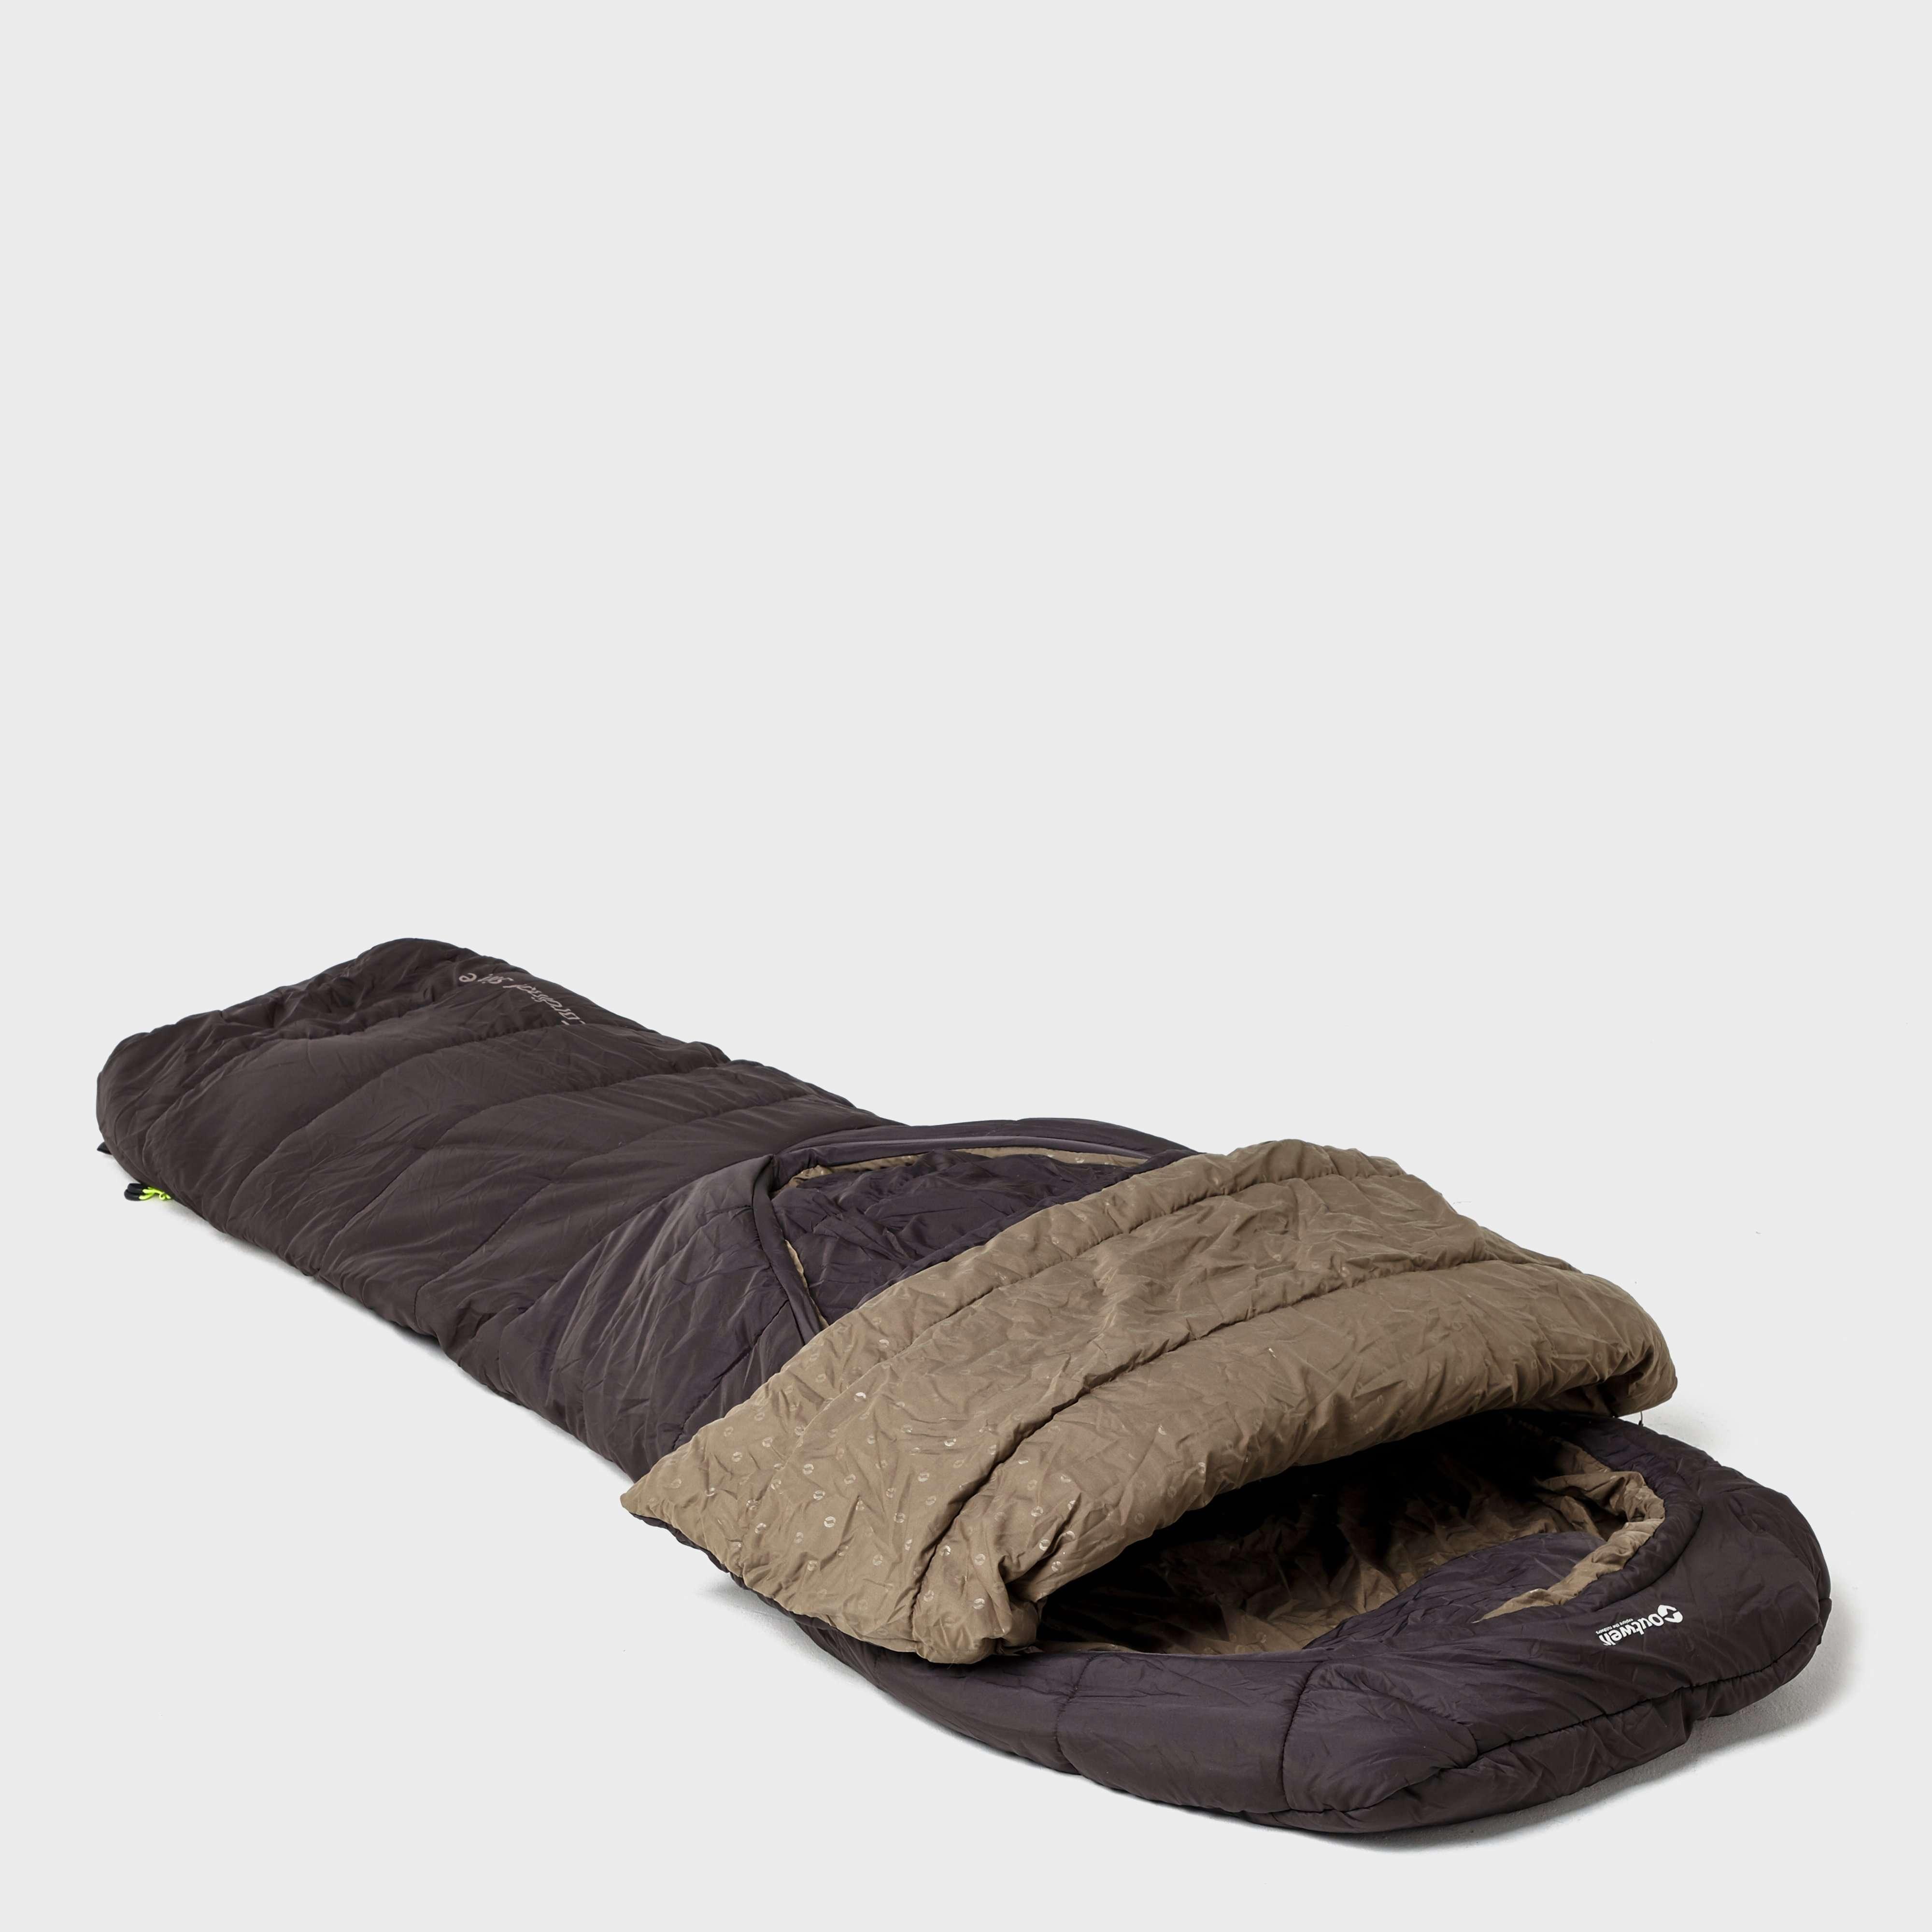 OUTWELL Cardinal Single Sleeping Bag